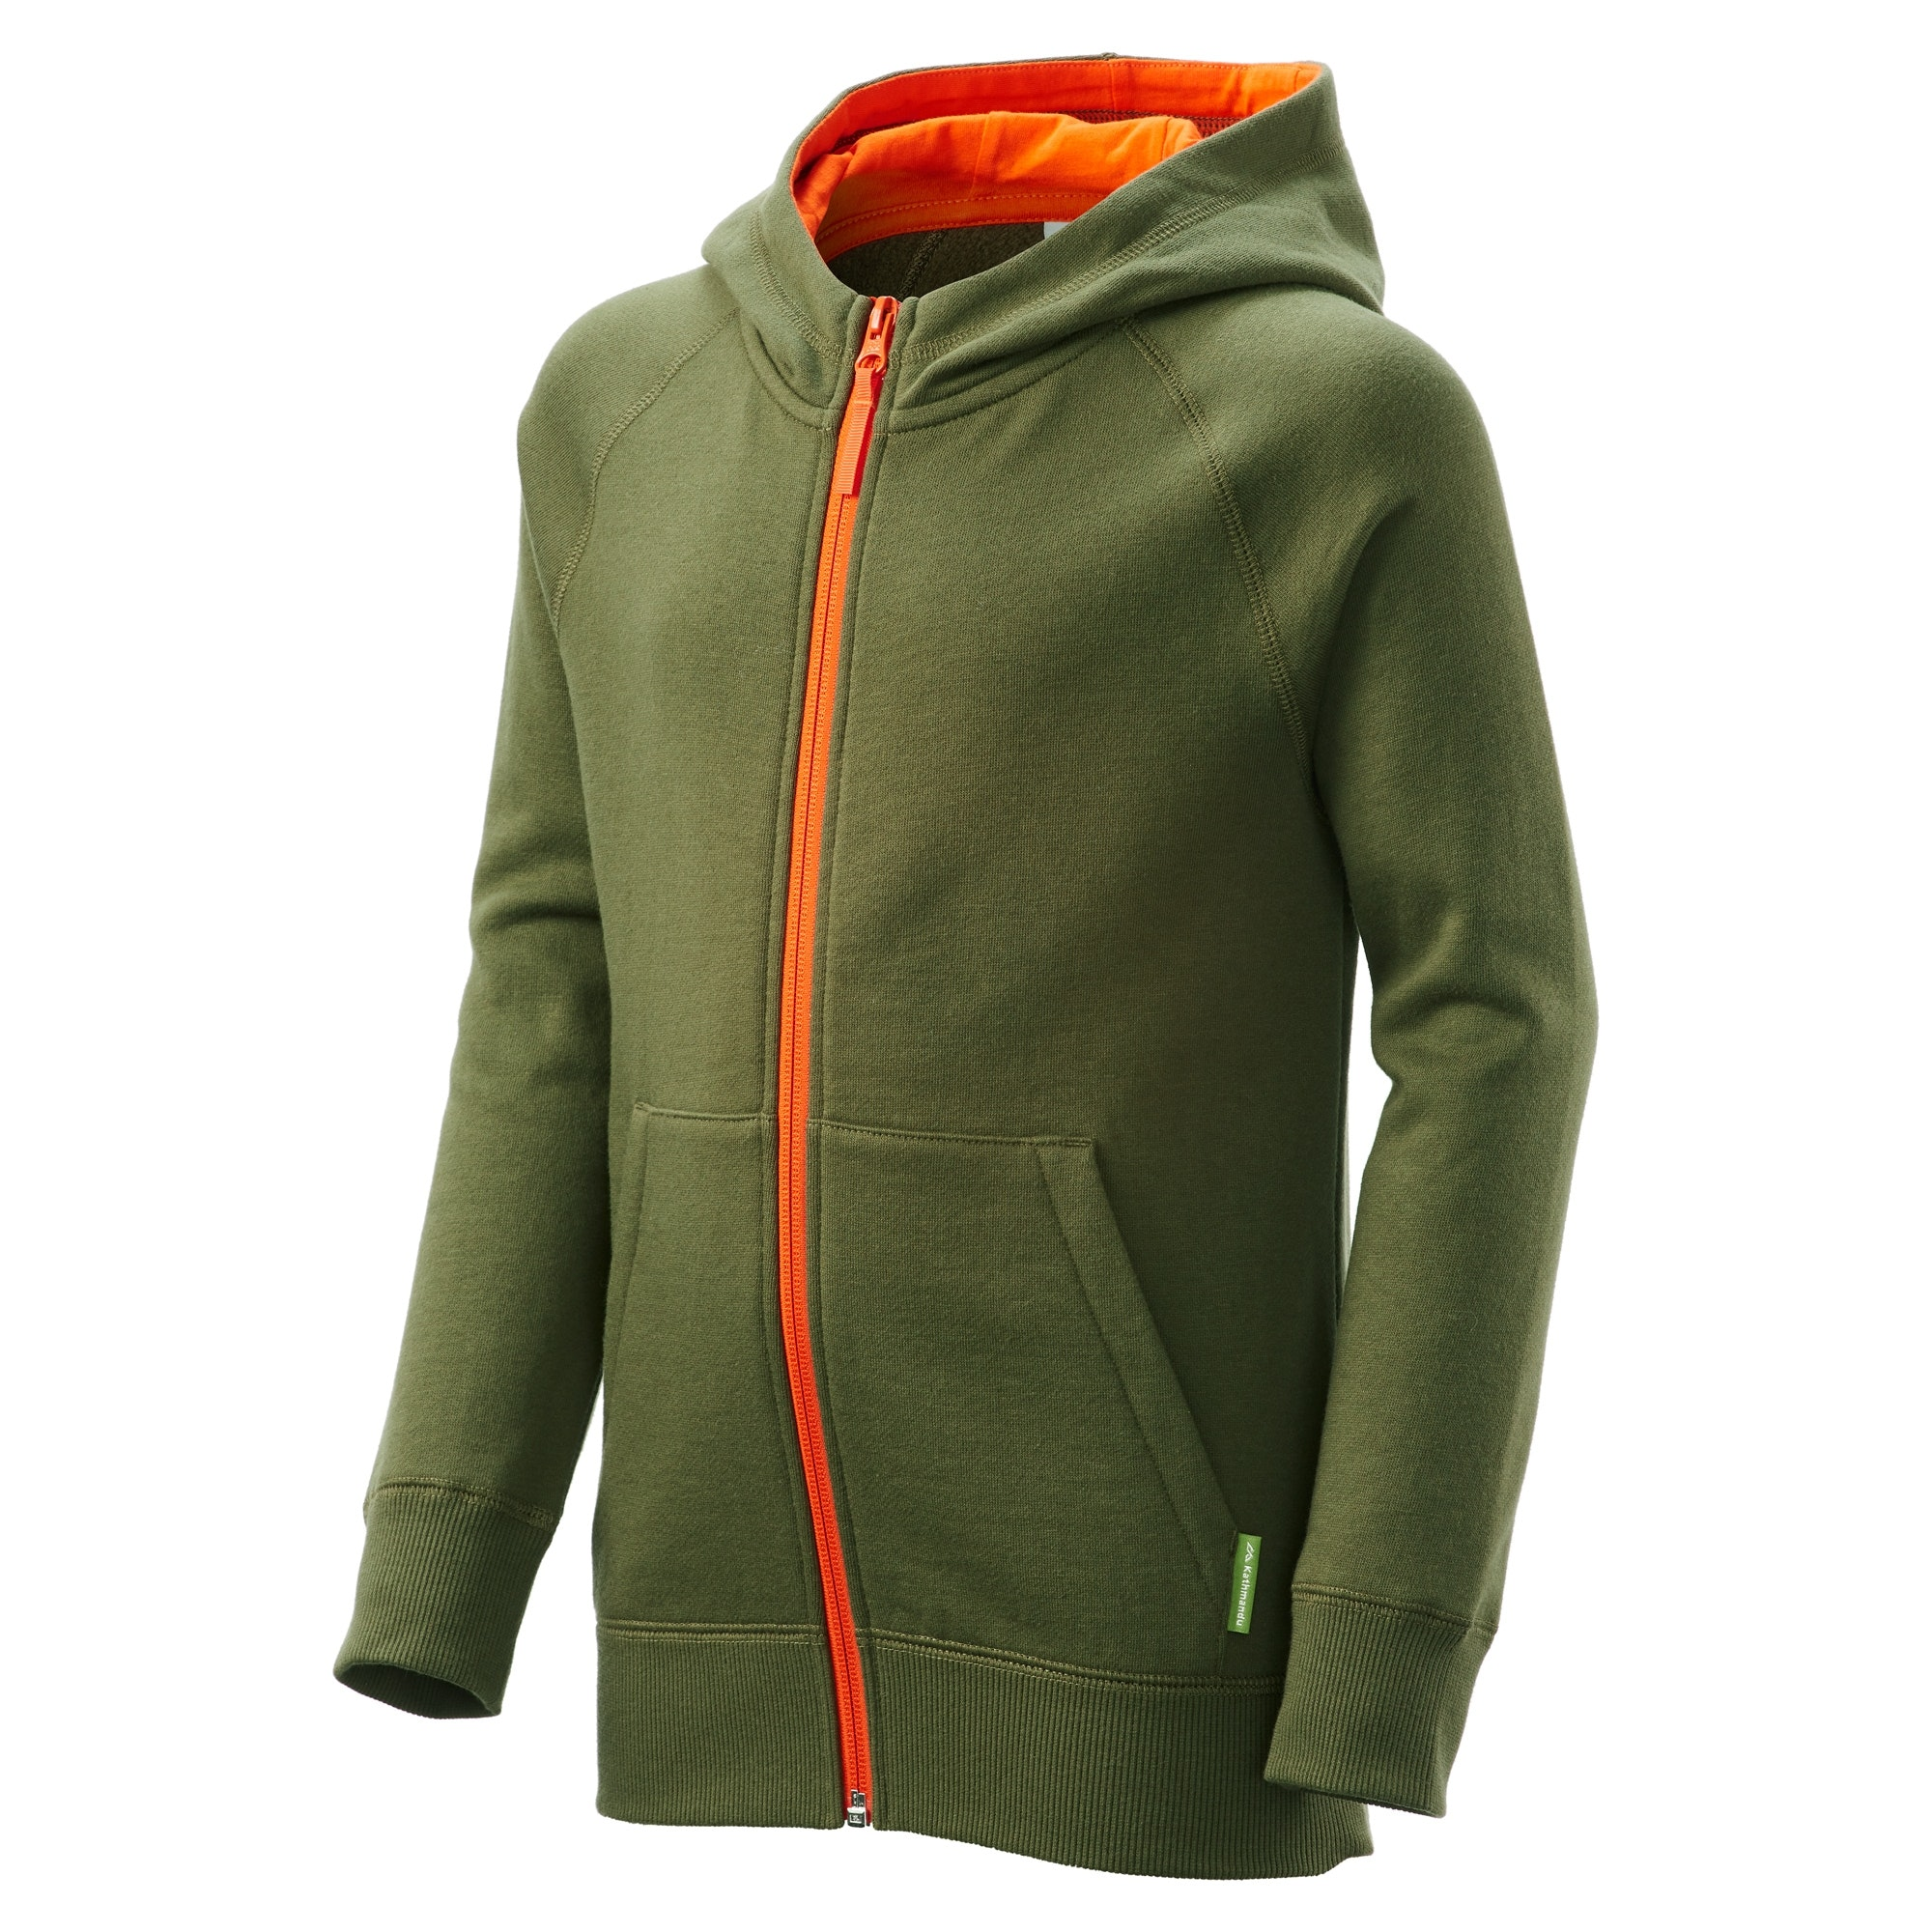 NEW-Kathmandu-Youth-Boy-039-s-Girl-039-s-Full-Zip-Hooded-Winter-Warm-Fleece-Jacket thumbnail 14